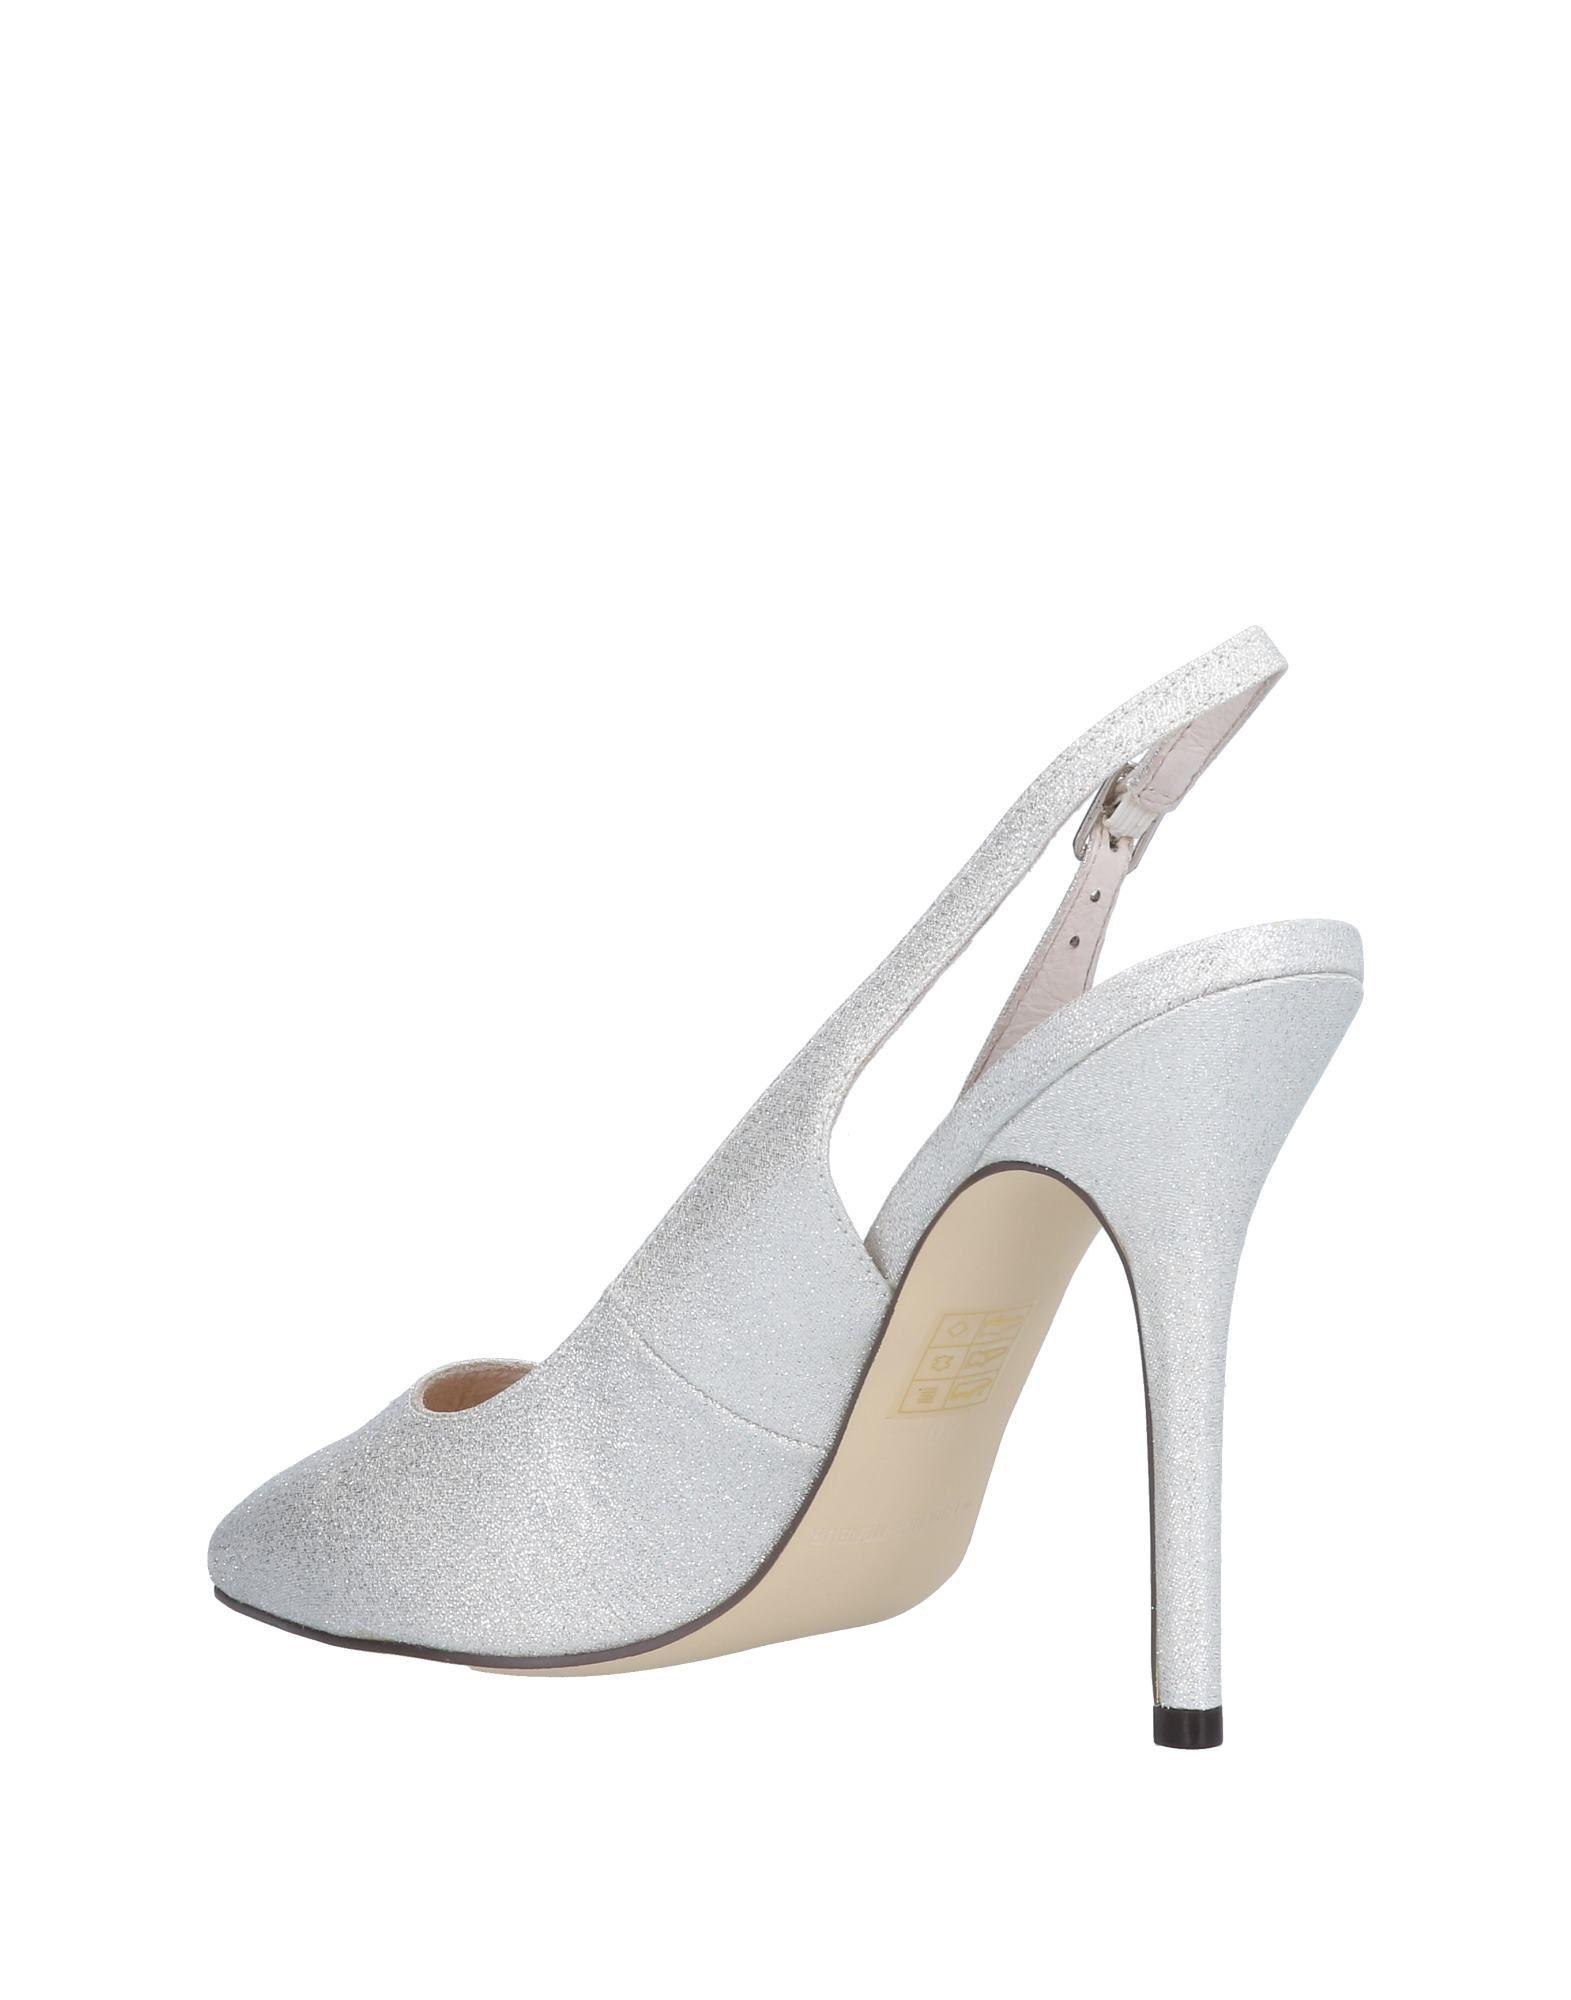 Menbur Pumps Damen  11498466VJ Heiße Schuhe Schuhe Schuhe 6ec476